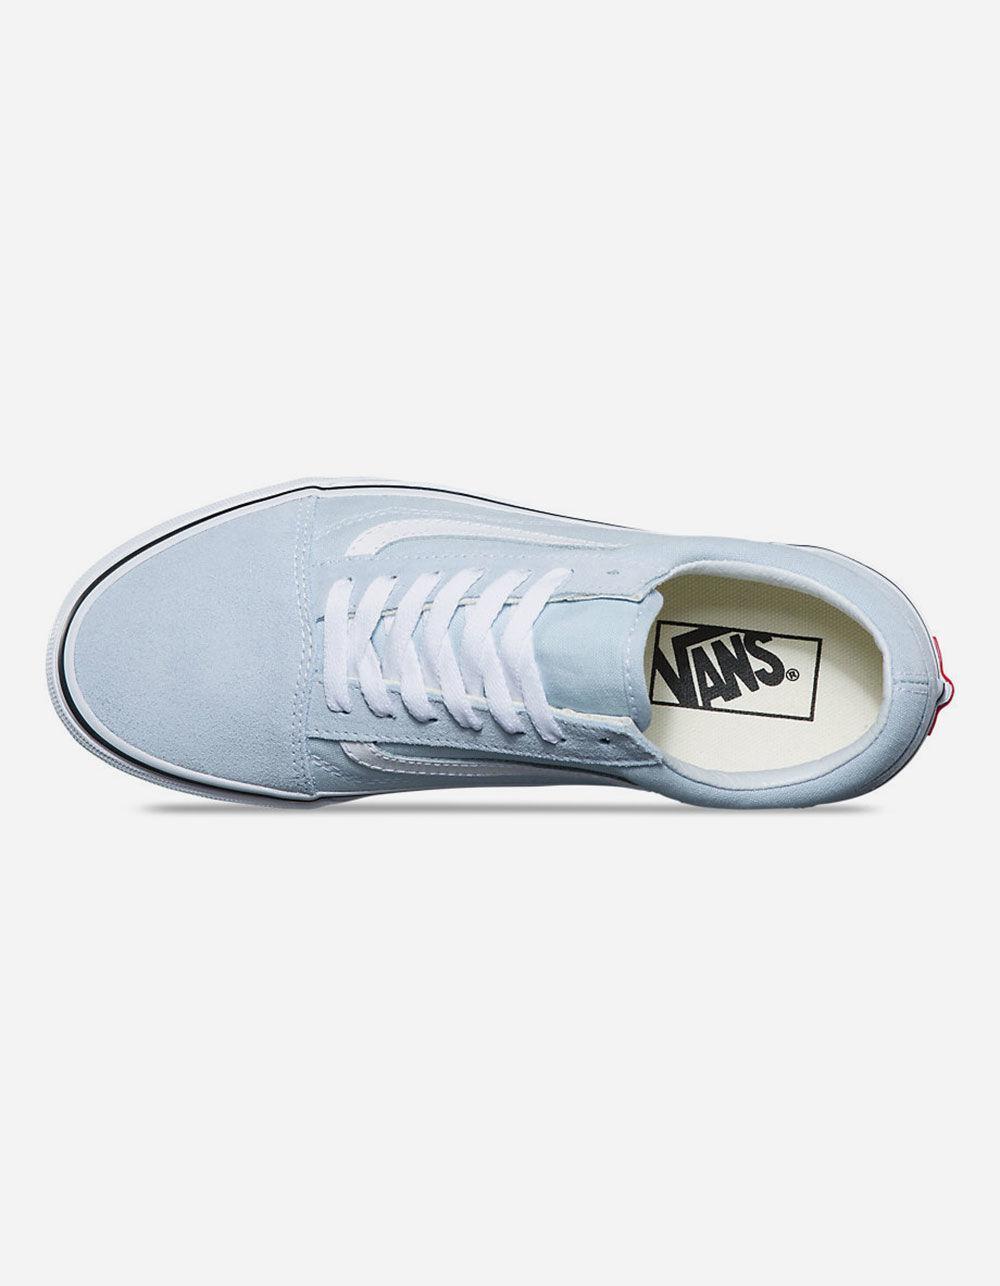 Lyst - Vans Old Skool Baby Blue   True White Womens Shoes in Blue 7ad84edc2